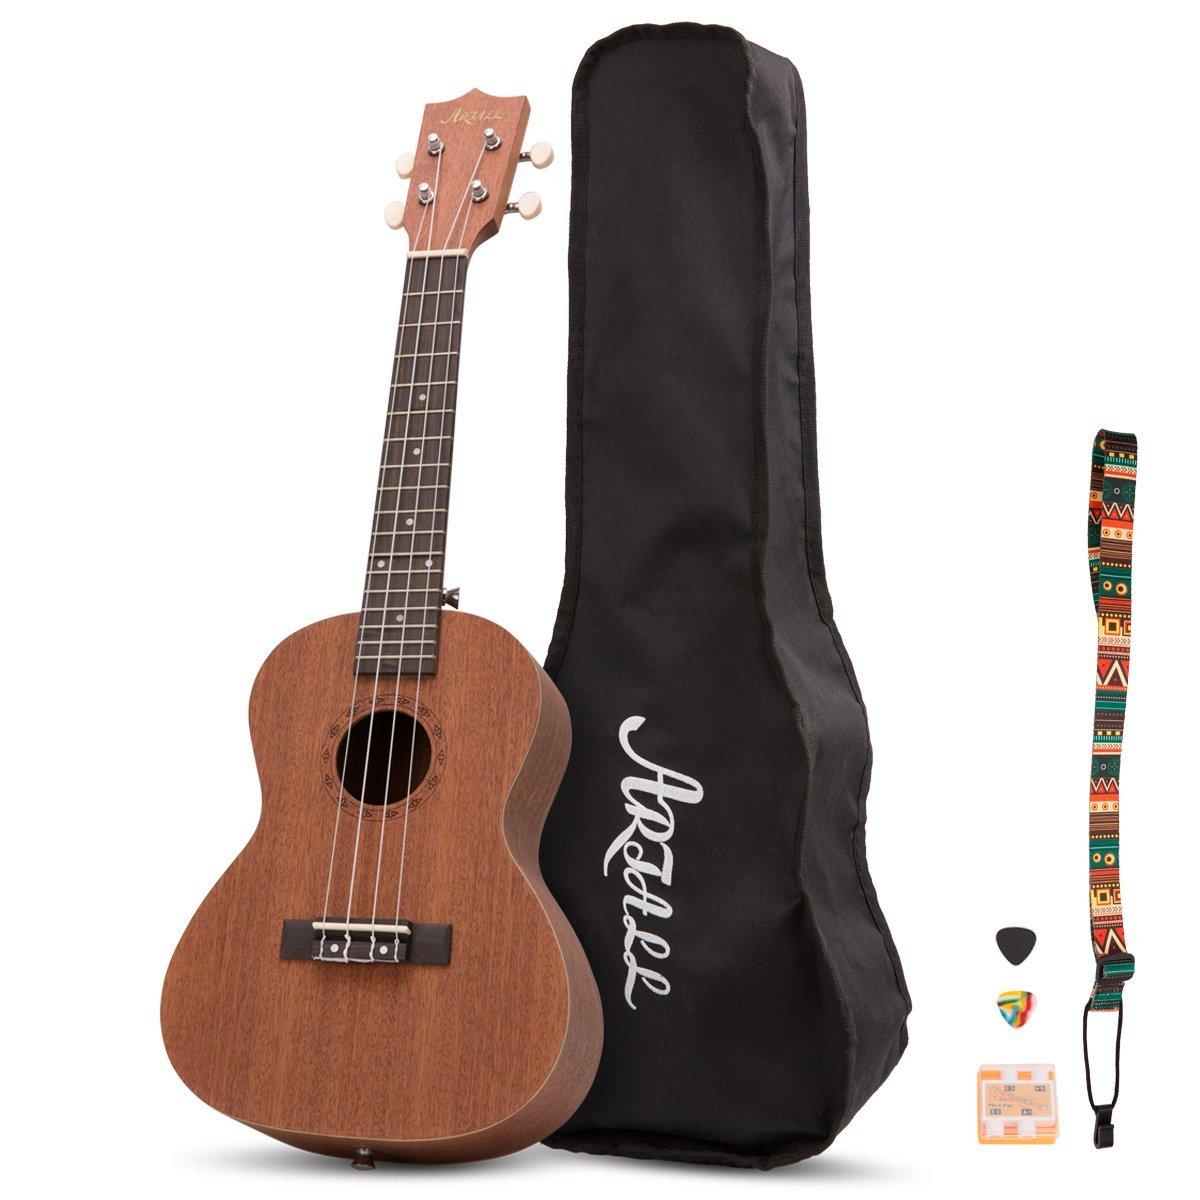 23 Inch Handcrafted Solid Wood Concert Ukulele $26.39